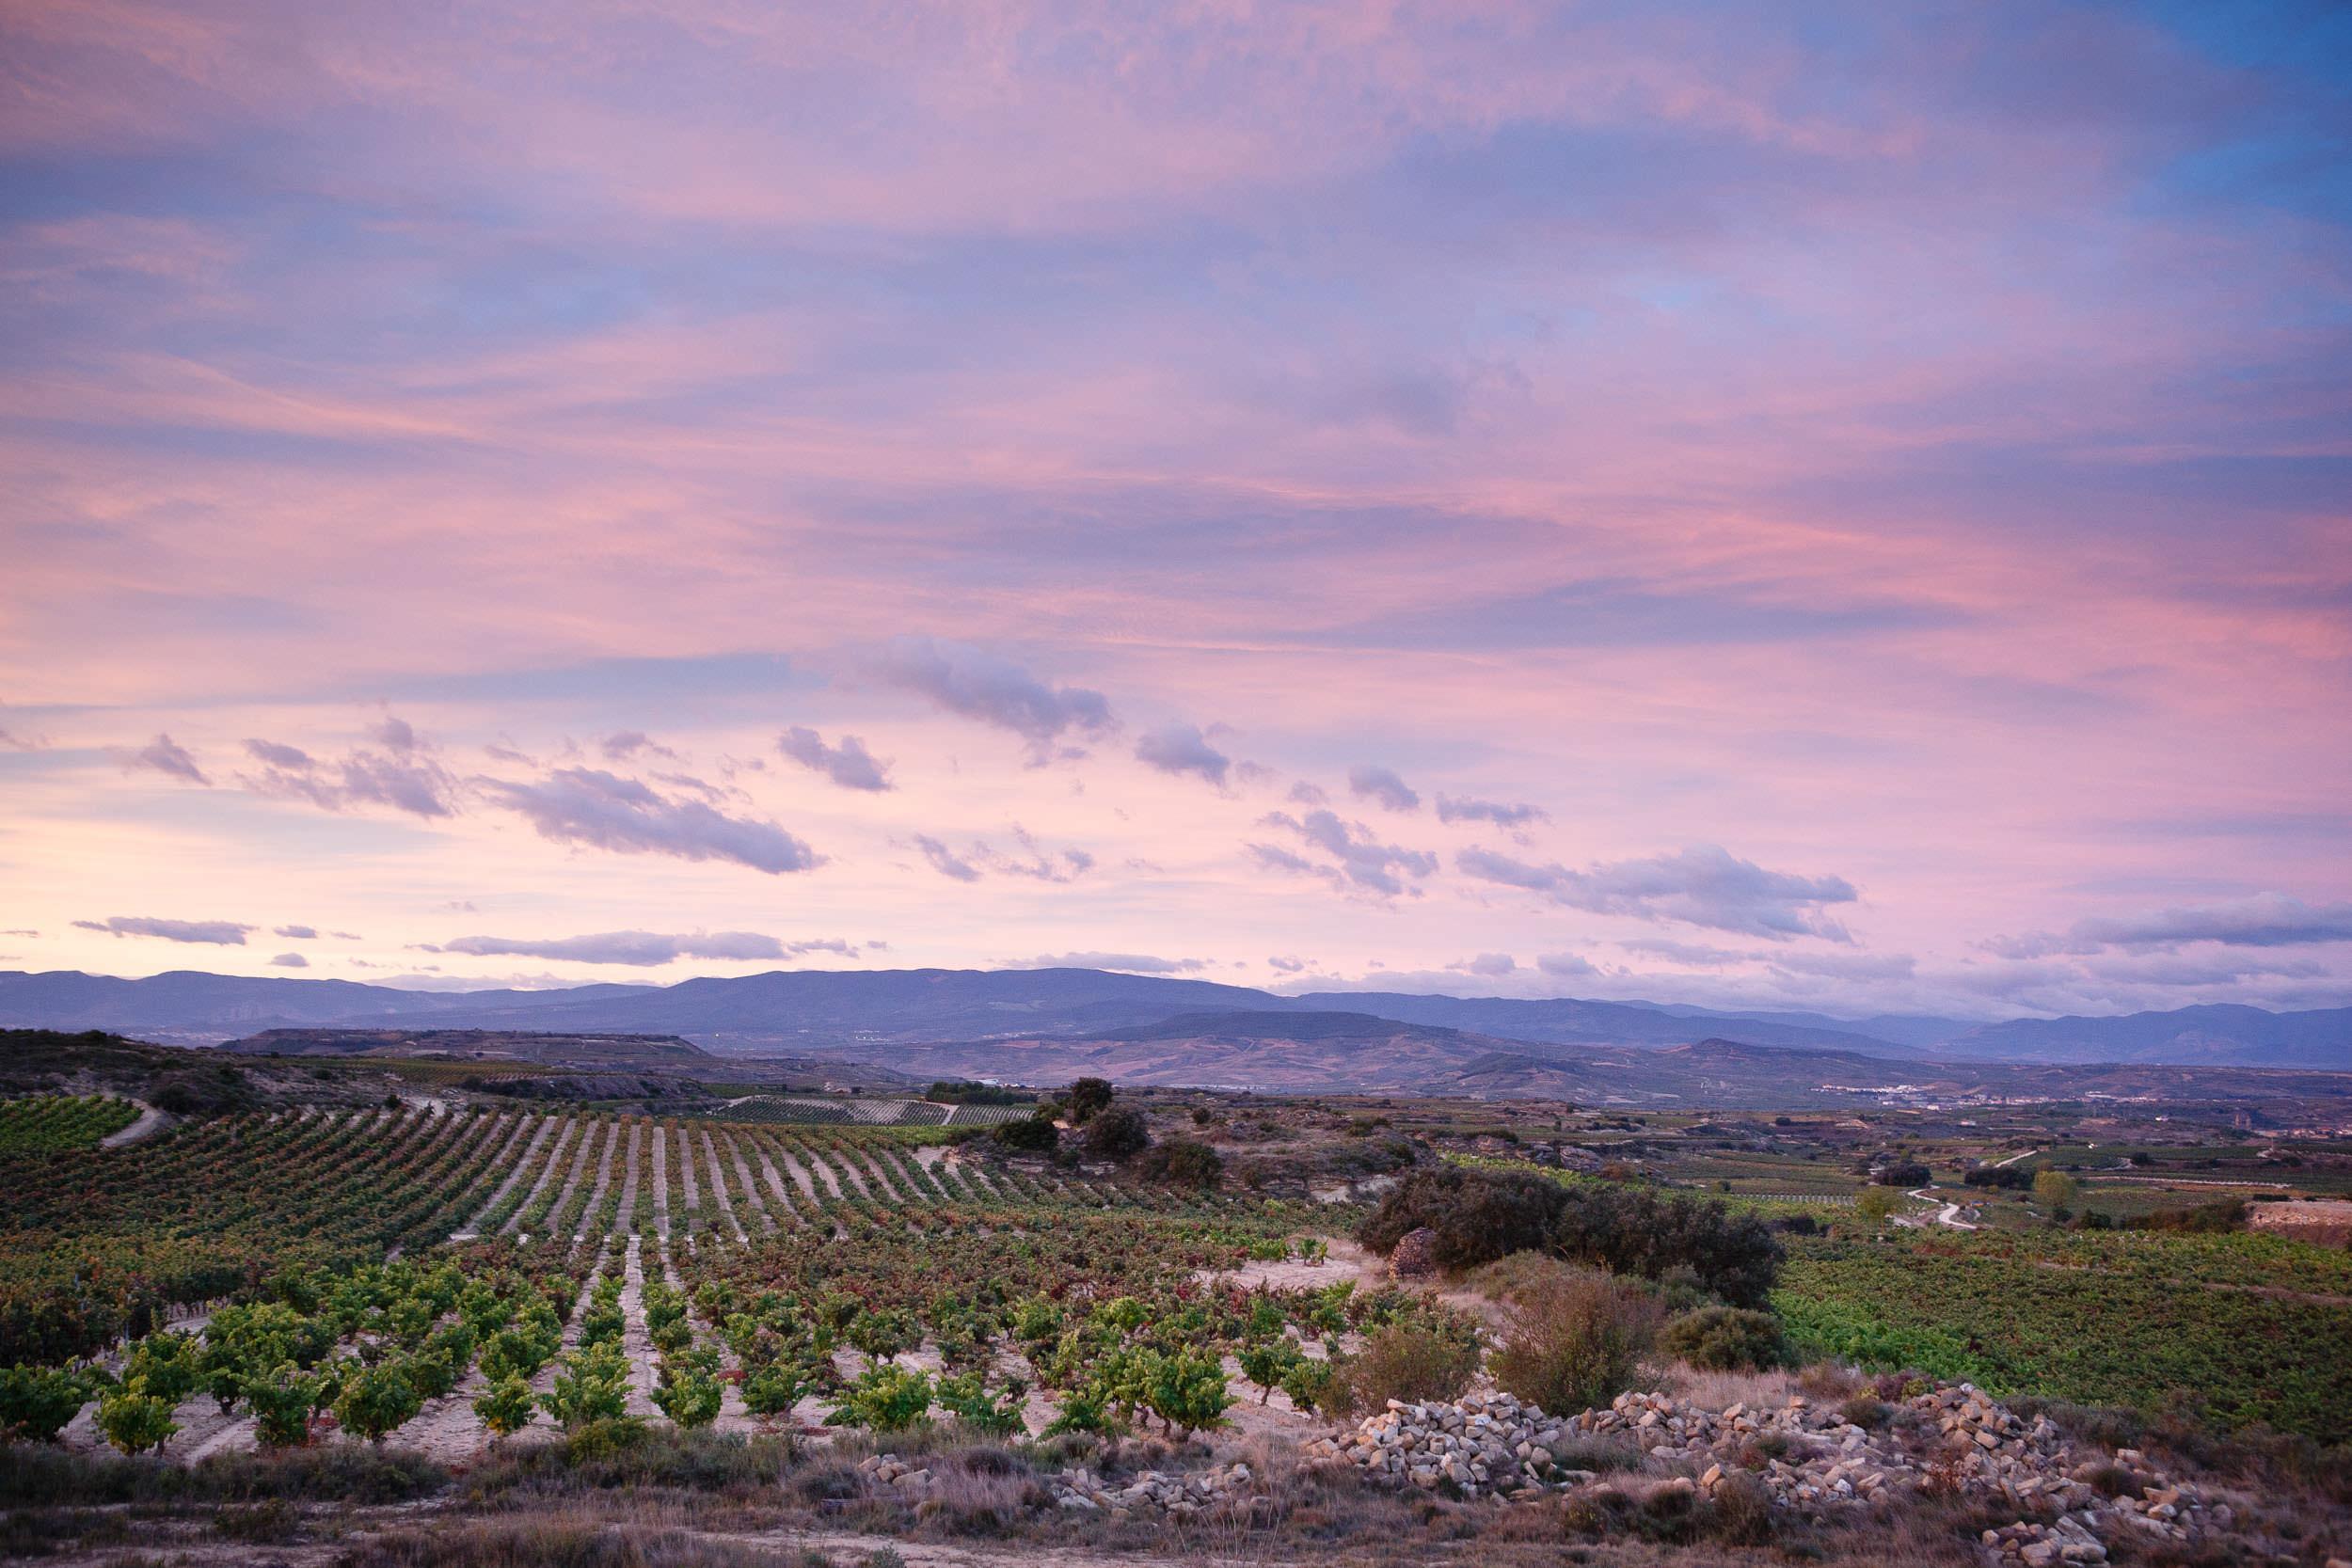 Wine Photography Grape Harvest in Ribera del Duero Toro and Rioja Alavesa Spain - James Sturcke  Photographer | sturcke.org_004.jpg